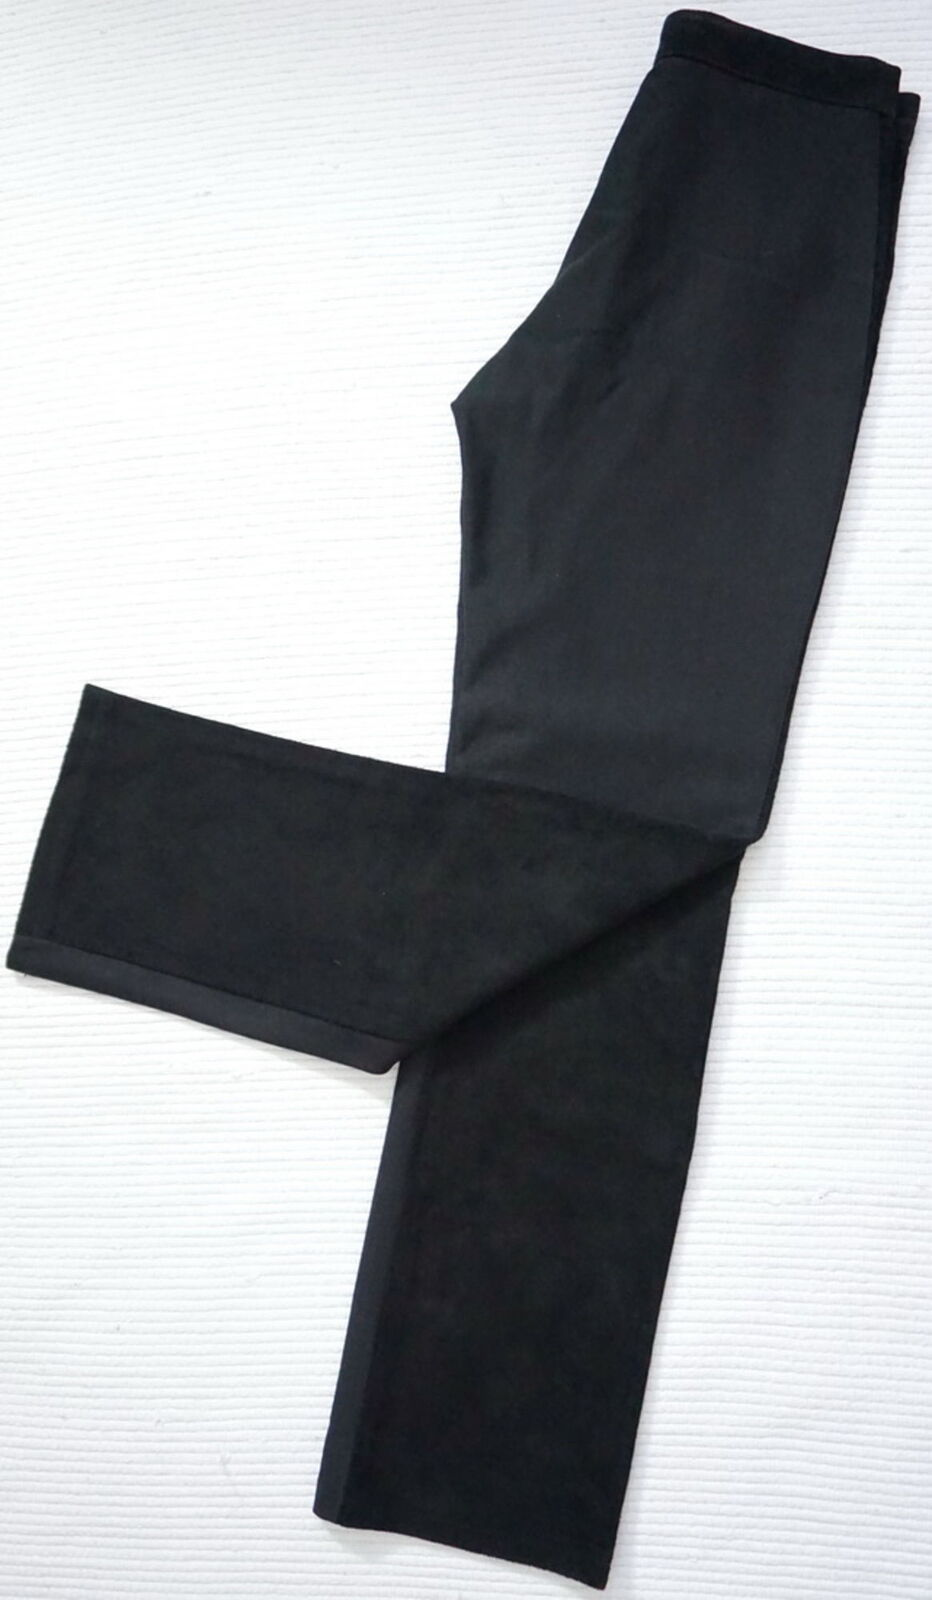 Maurizio moderna stretch Lederhose camoscio nero. Taglia 38 Pantaloni in pelle